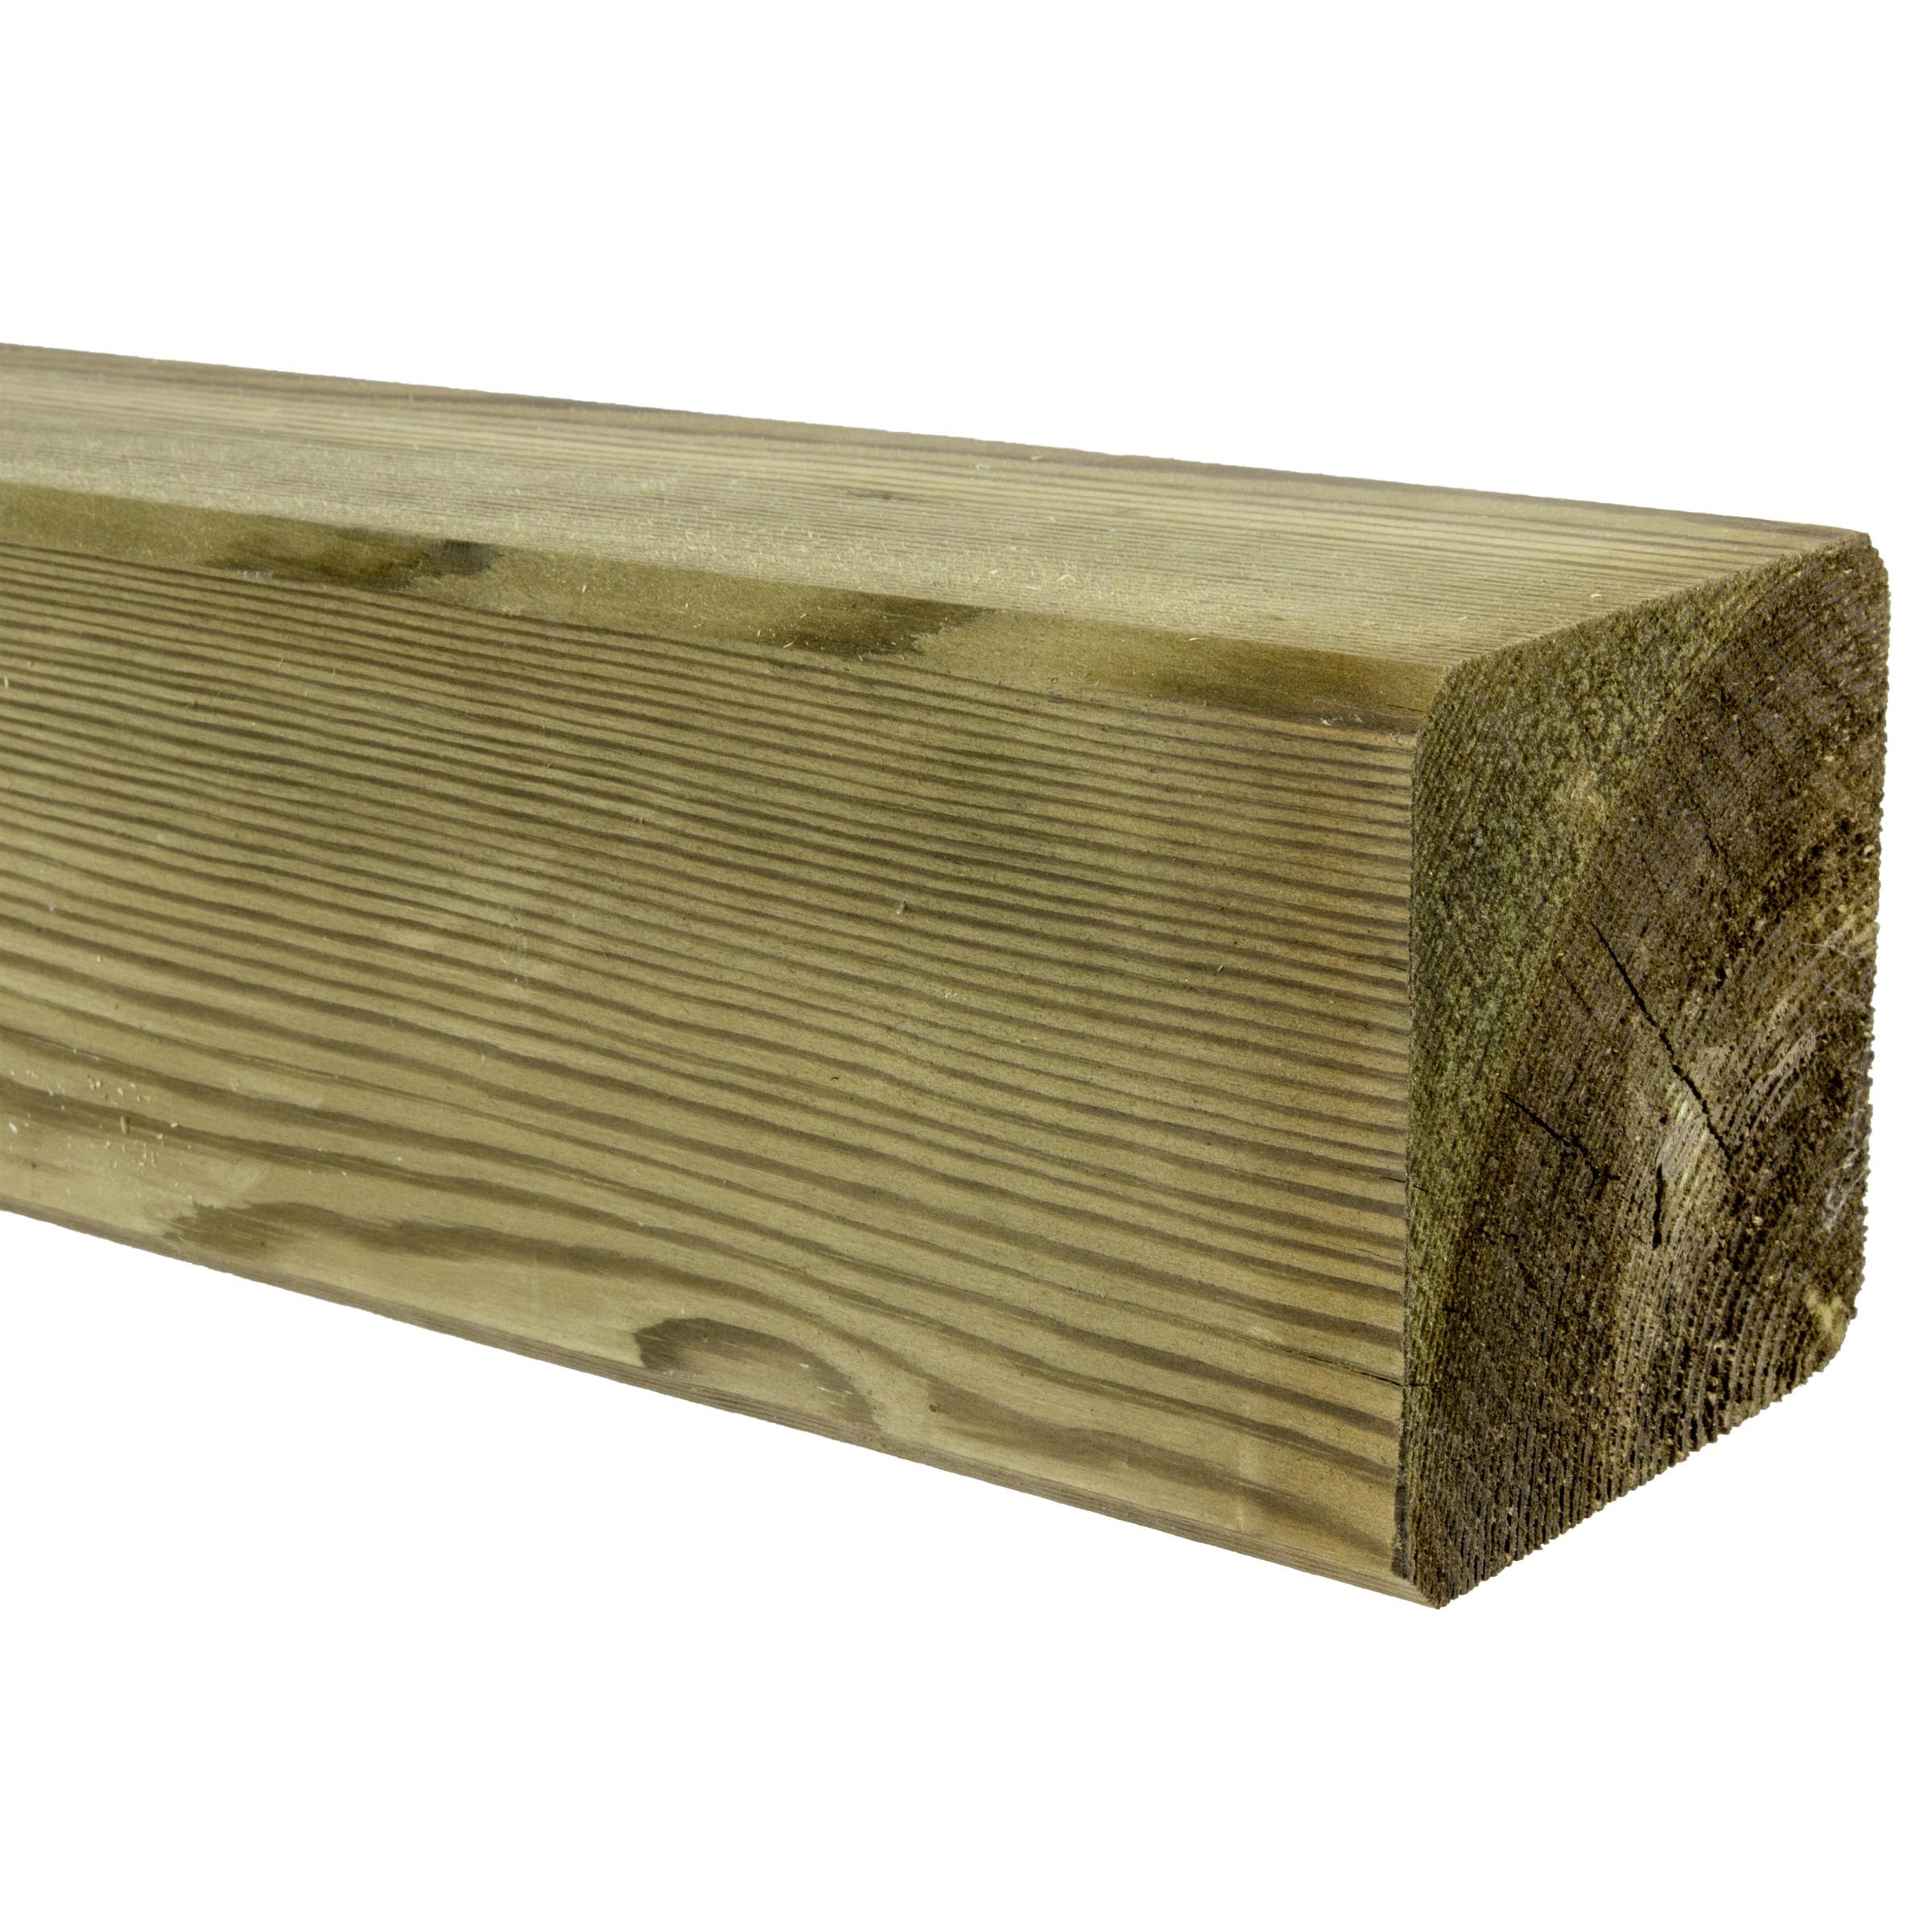 Tuinpaal geimpregneerd 8,8x8,8 cm, lengte 240 cm